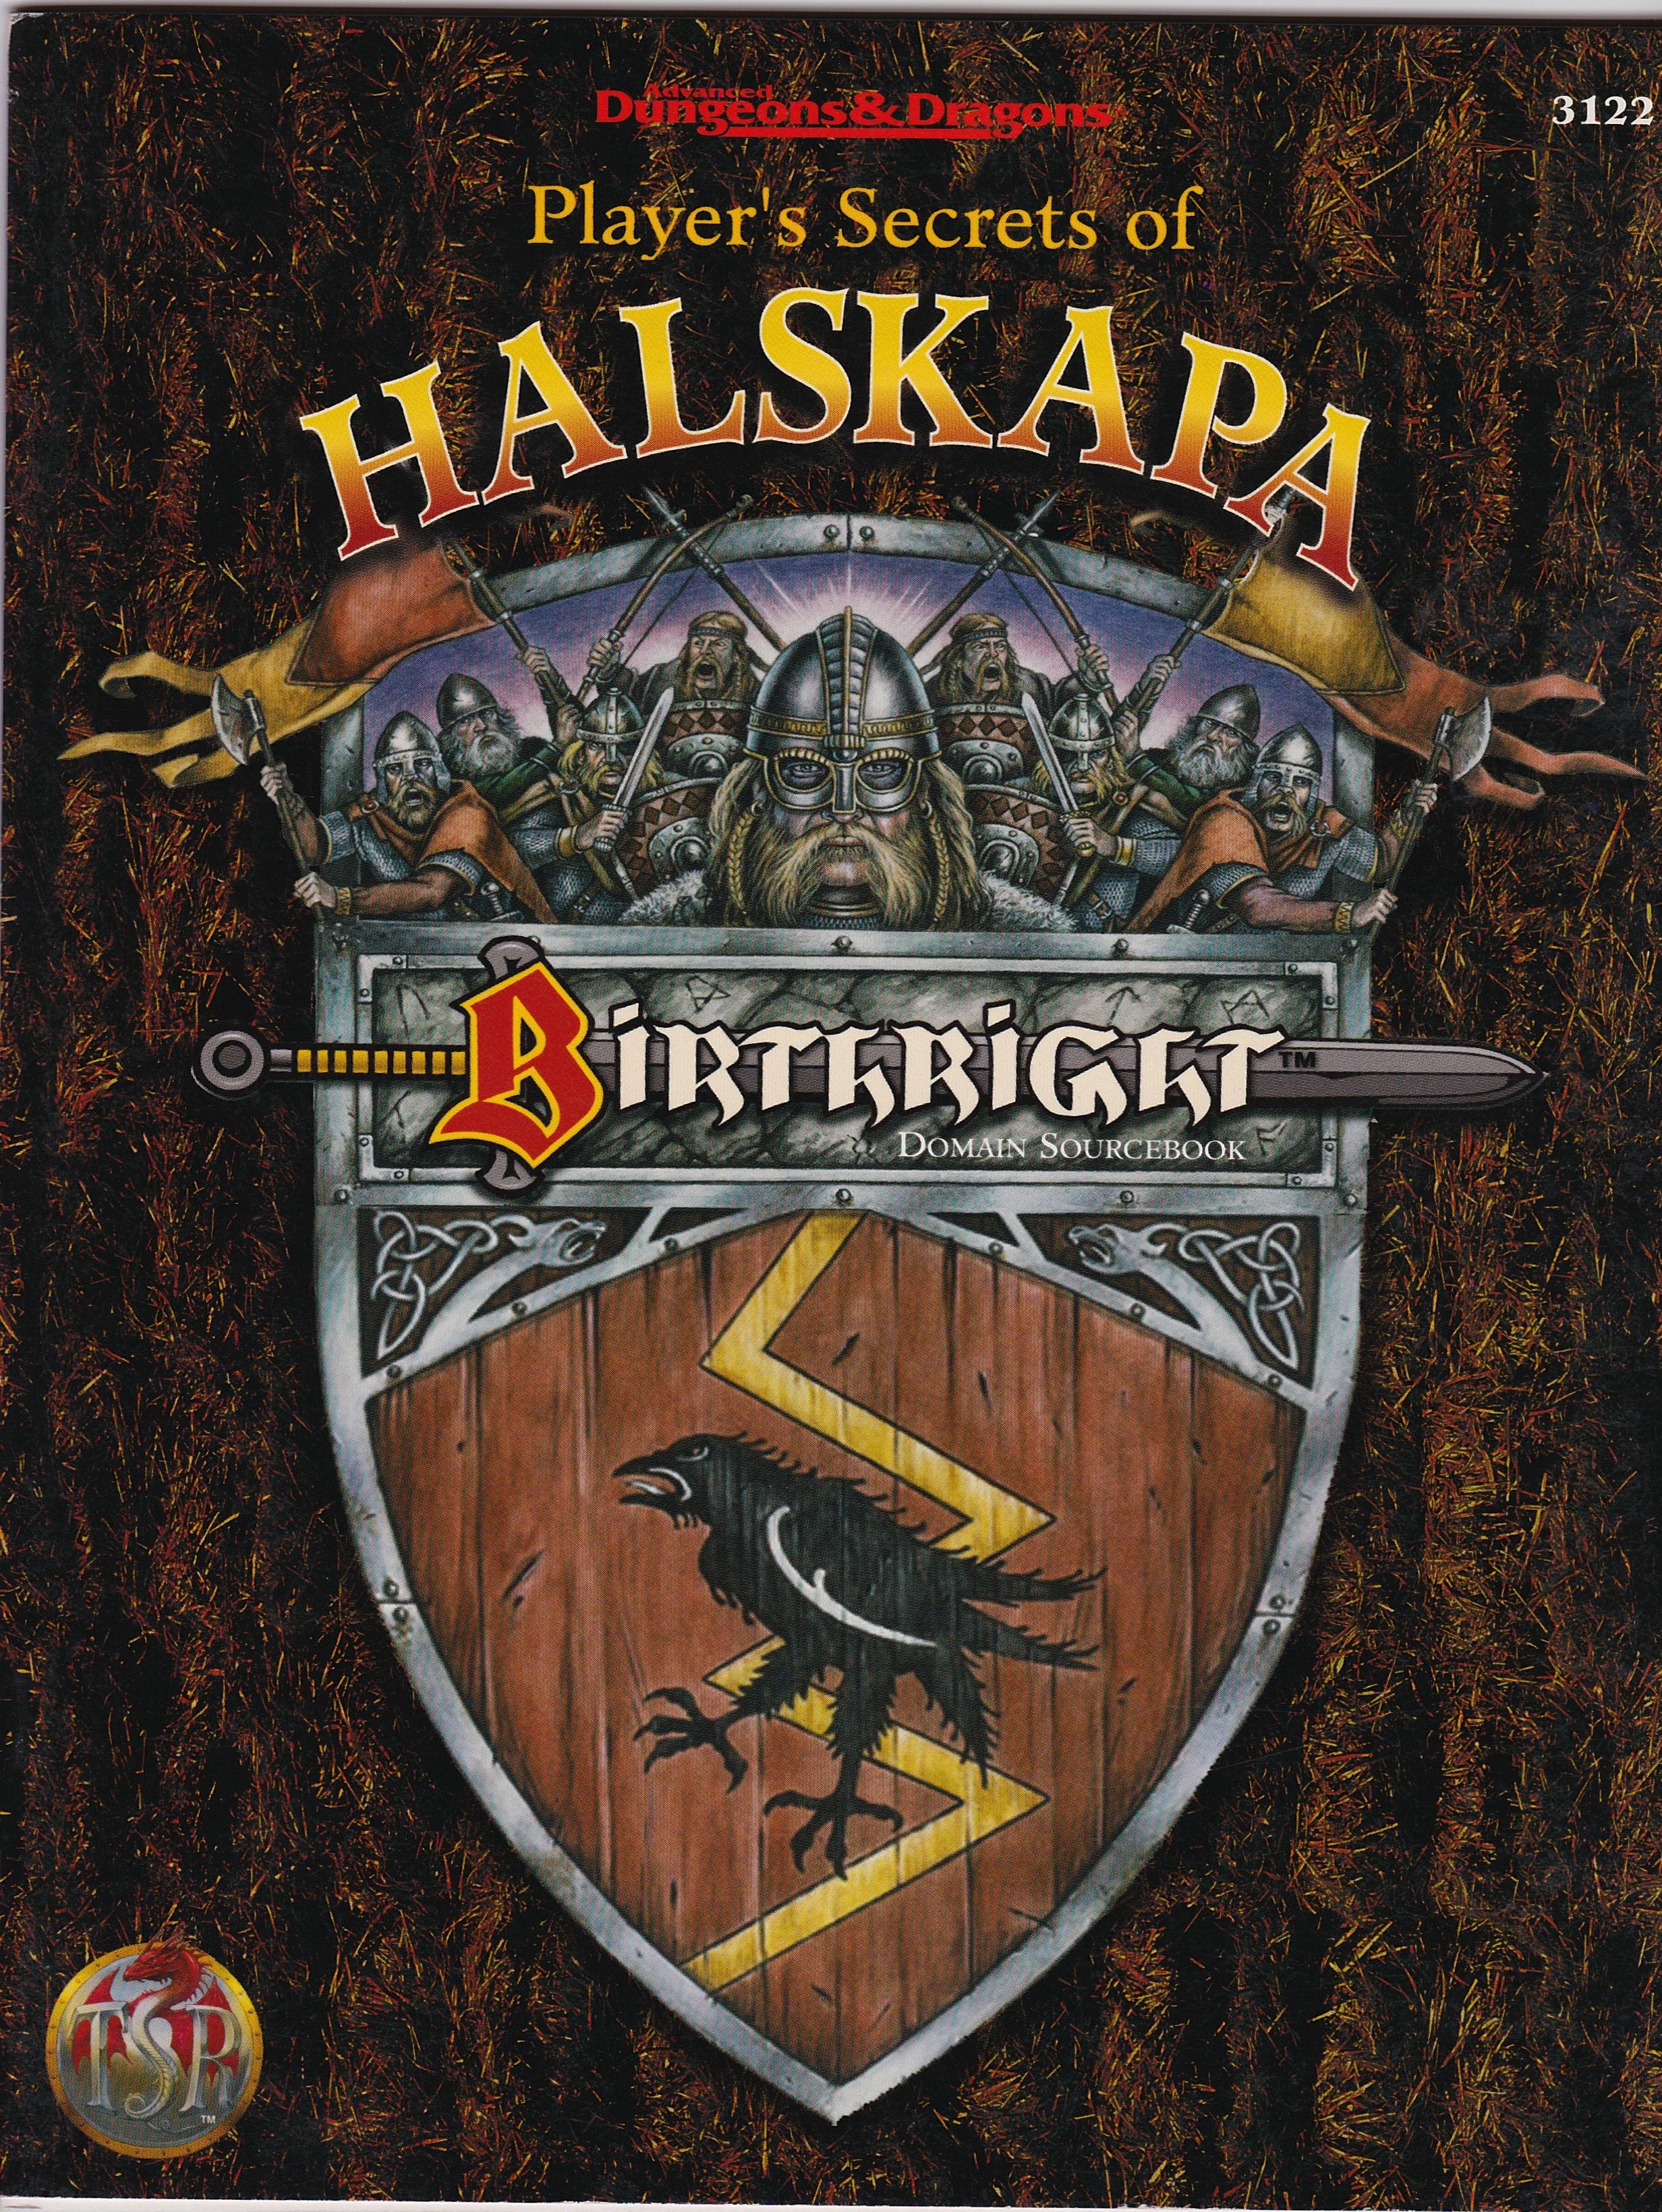 AD&D Birthright, Player's secret of Halskapa